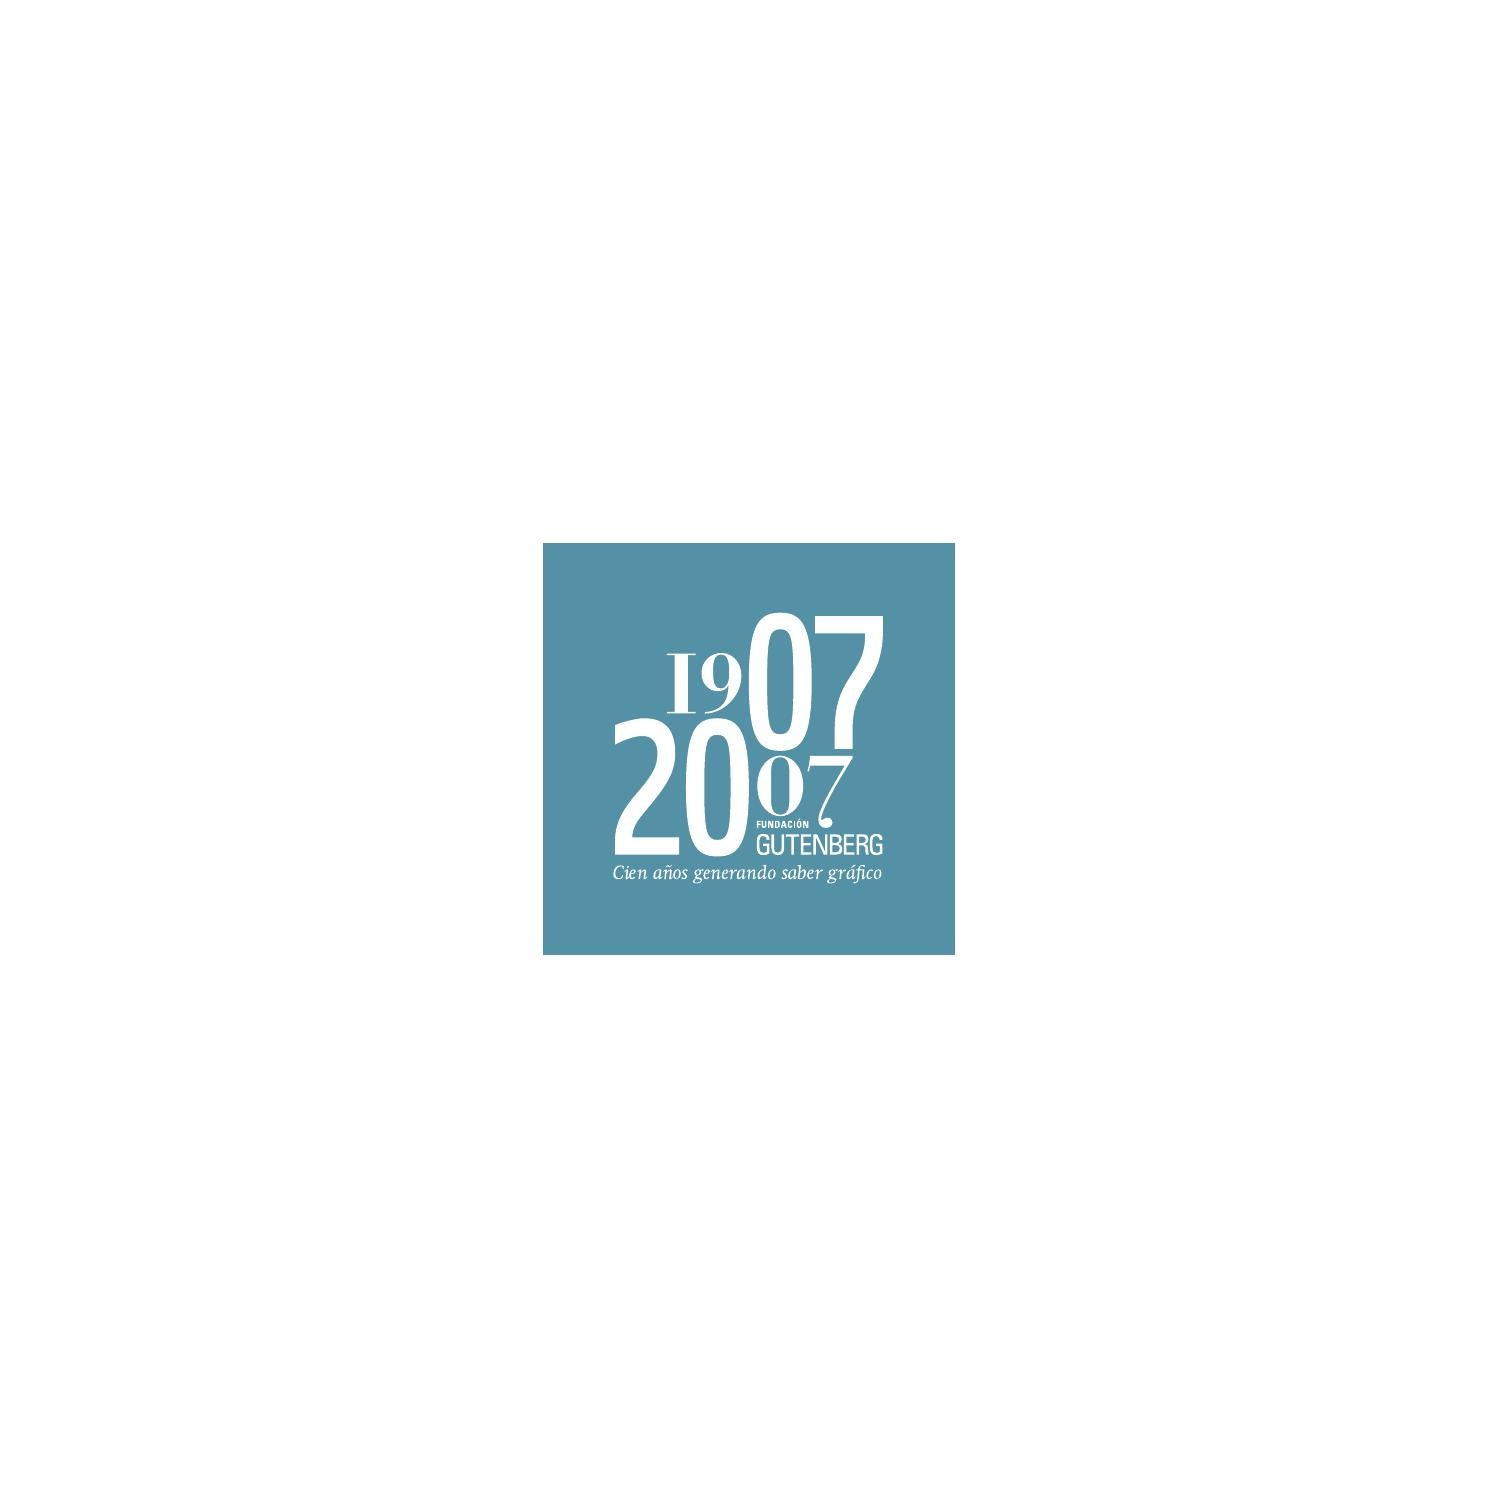 Fundaci N Gutenberg 100 A Os De Historia 1907 2007 By  # Muebles Faustino Punzon